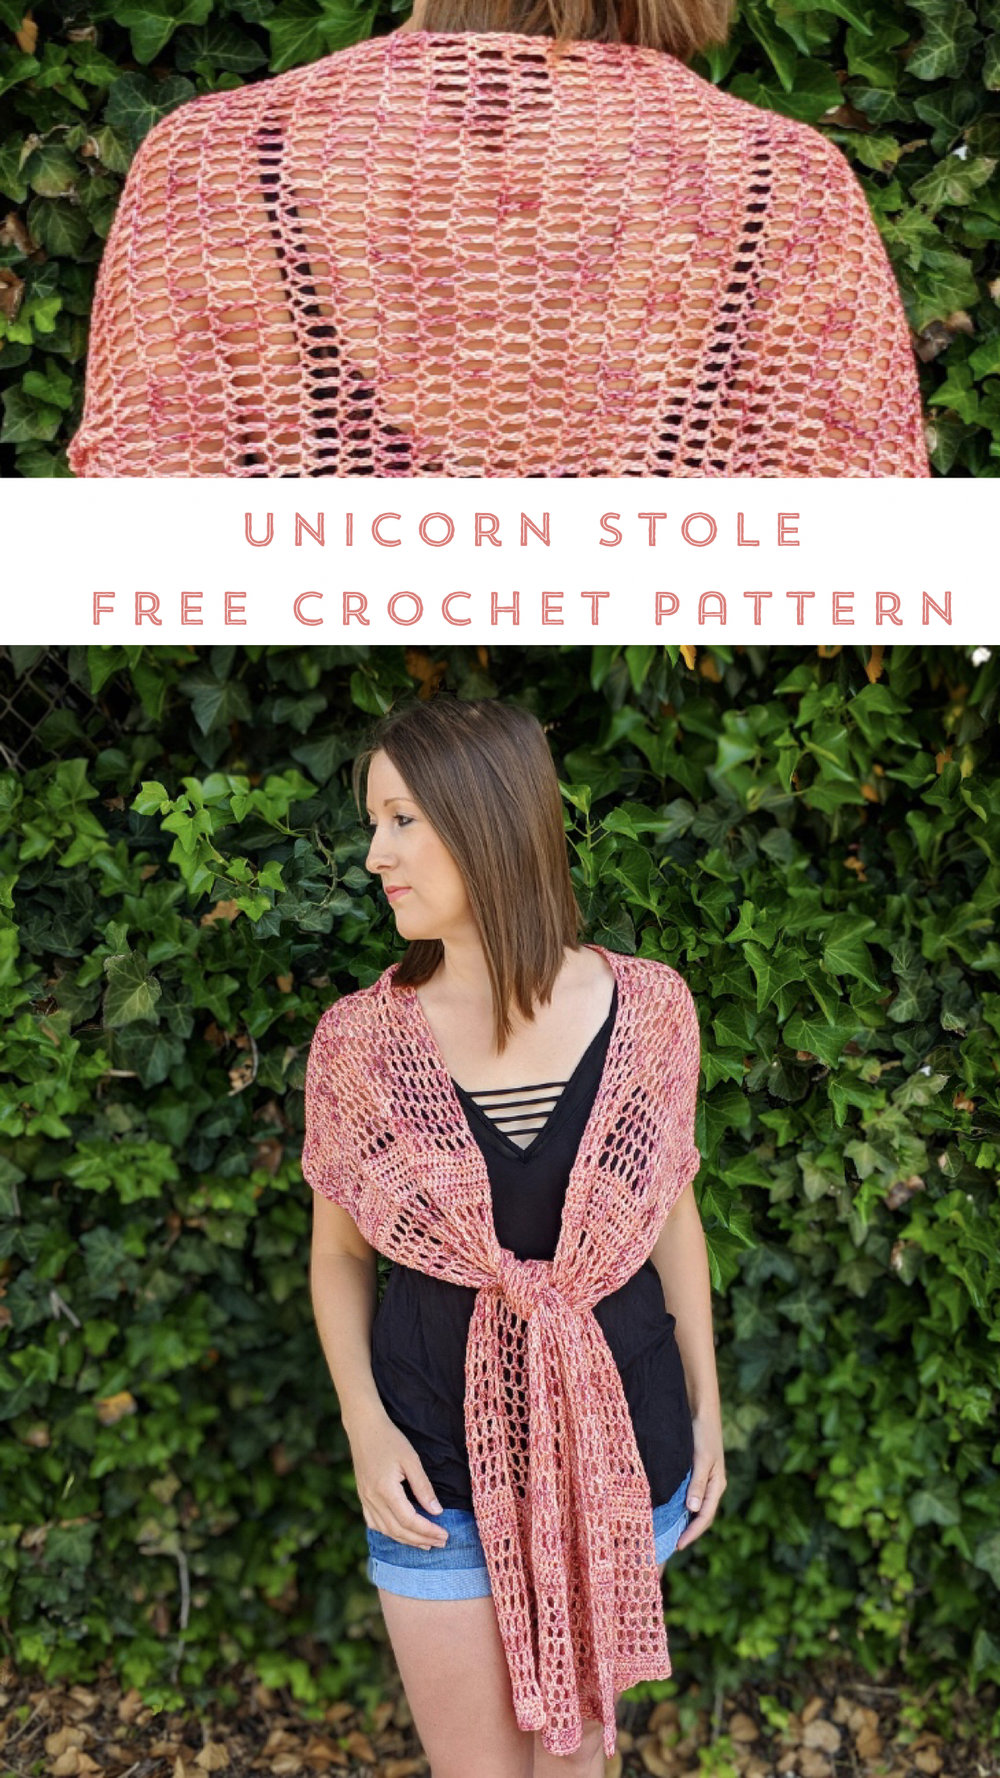 UnicornStole_Free_Crochet_Pattern_1f.jpg